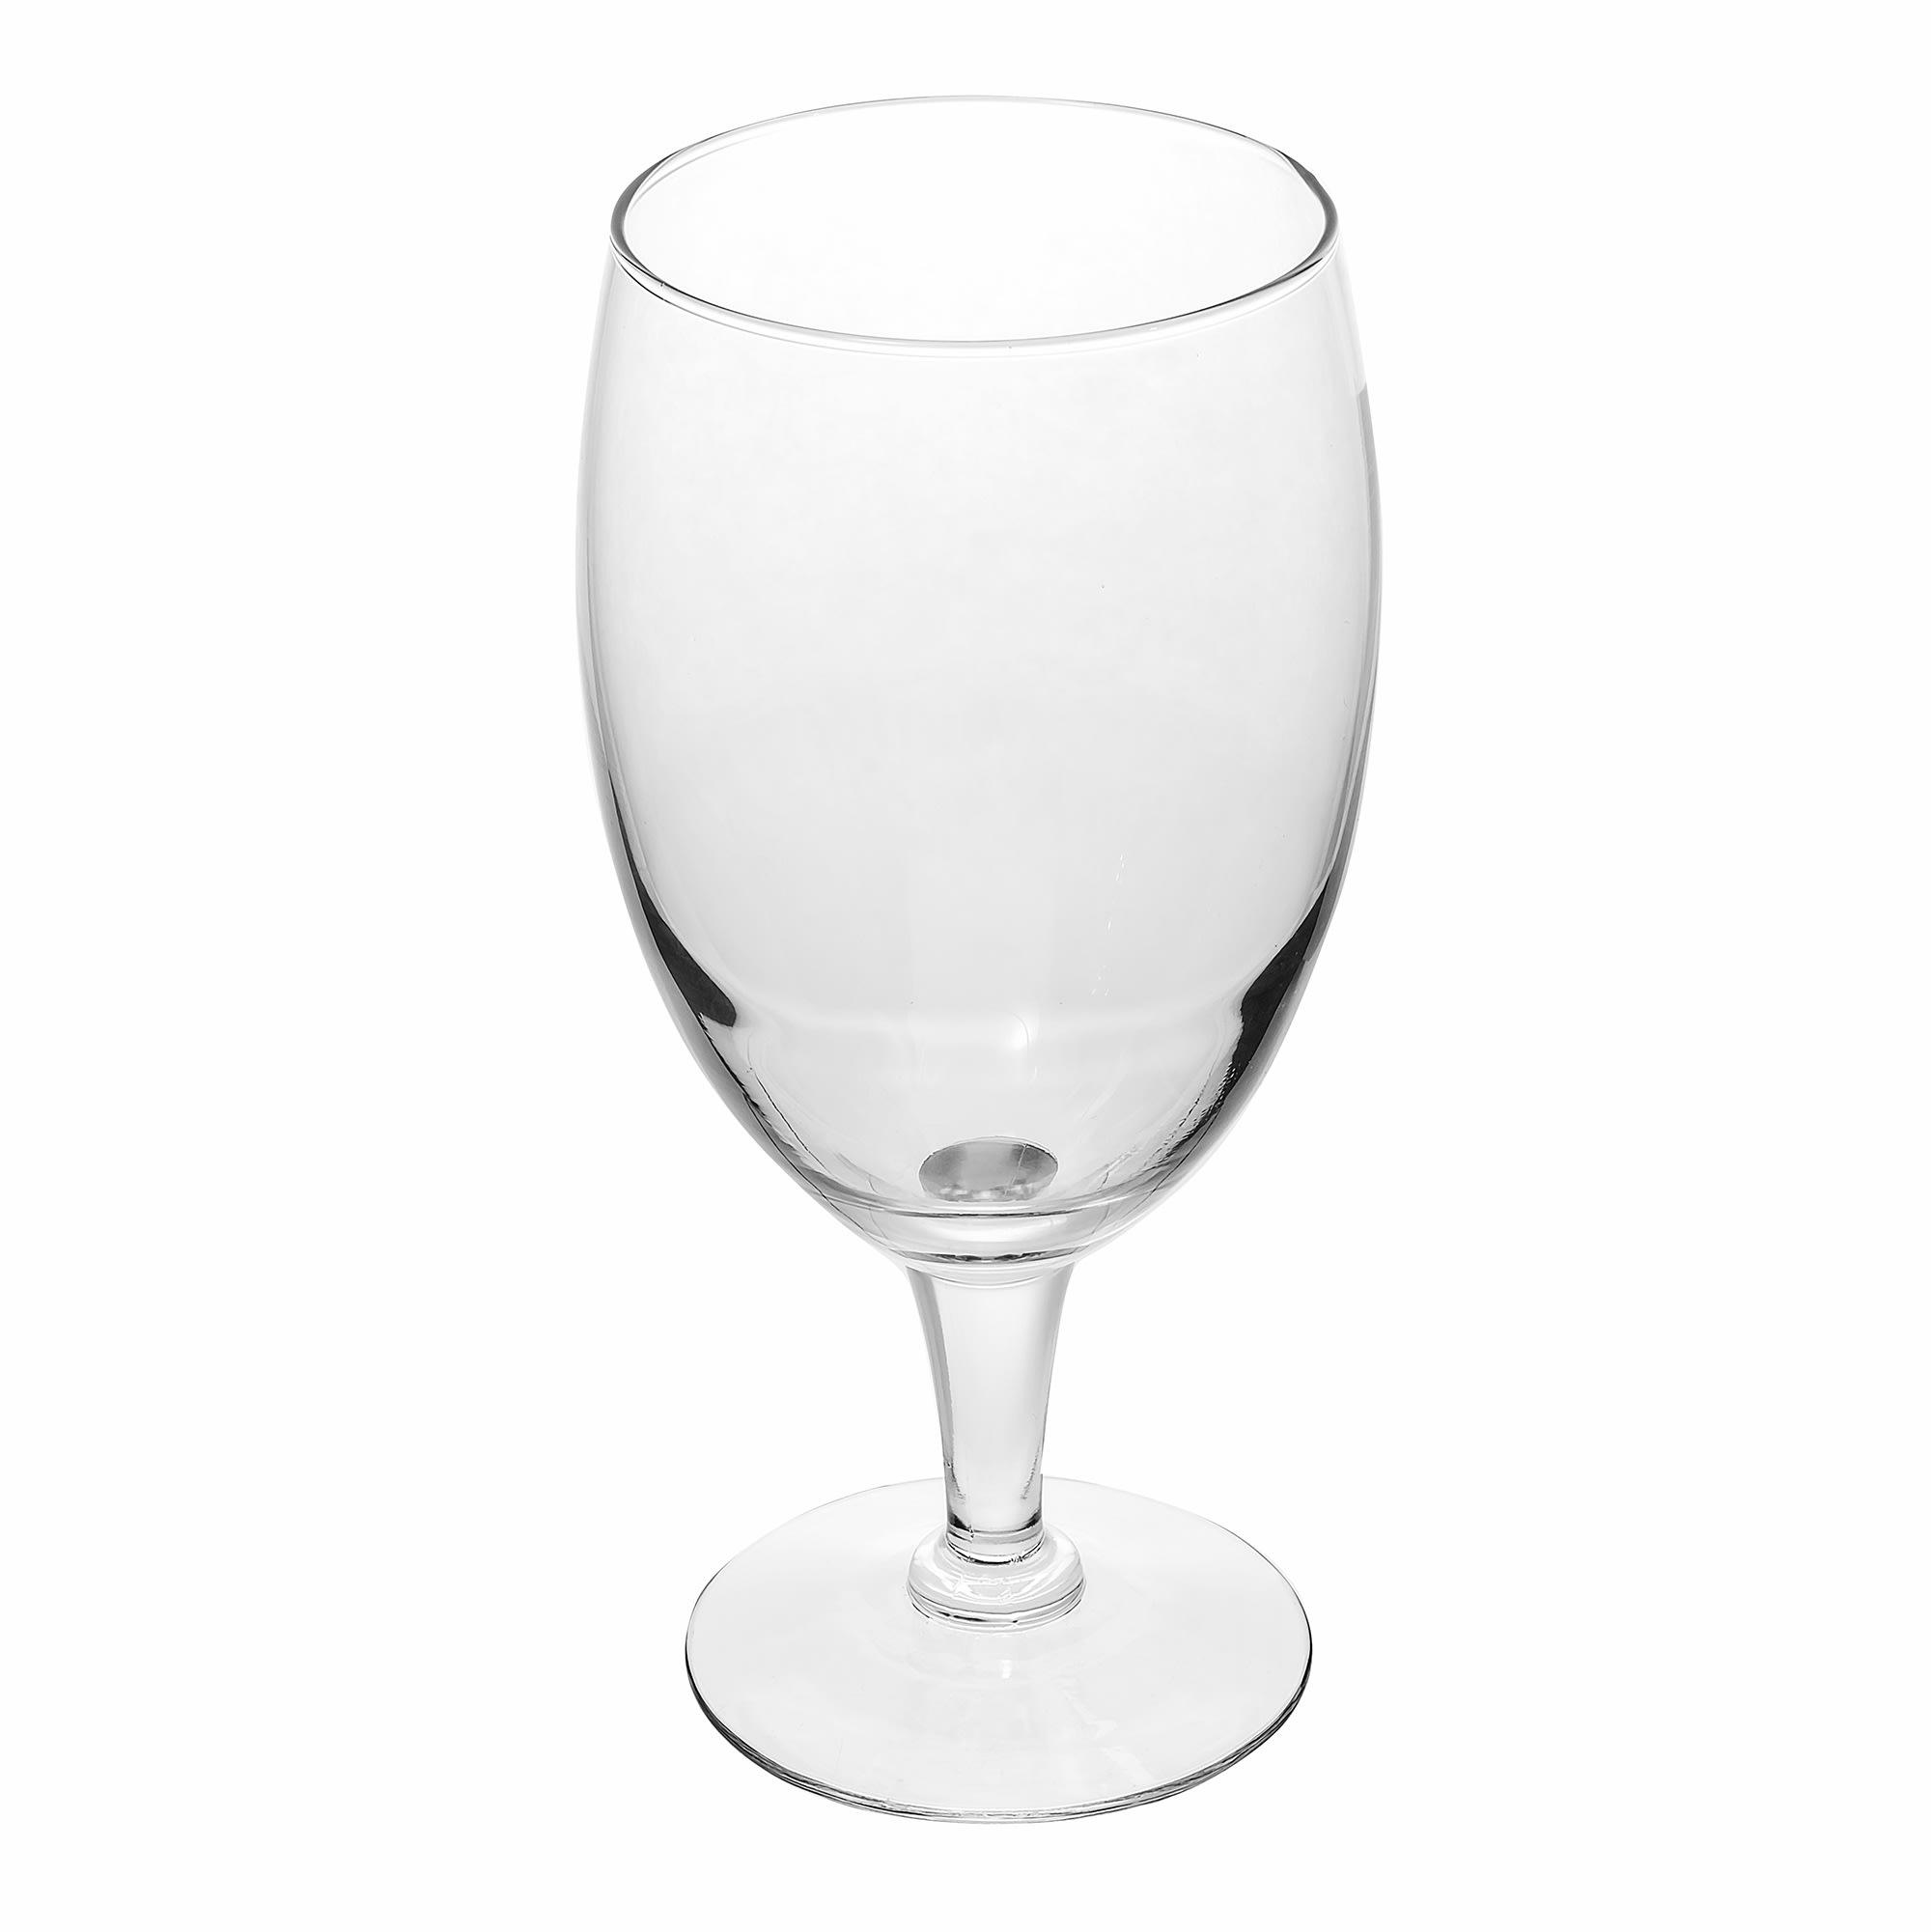 Libbey 8439 16.5-oz Citation Iced Tea Glass - Safedge Rim Guarantee